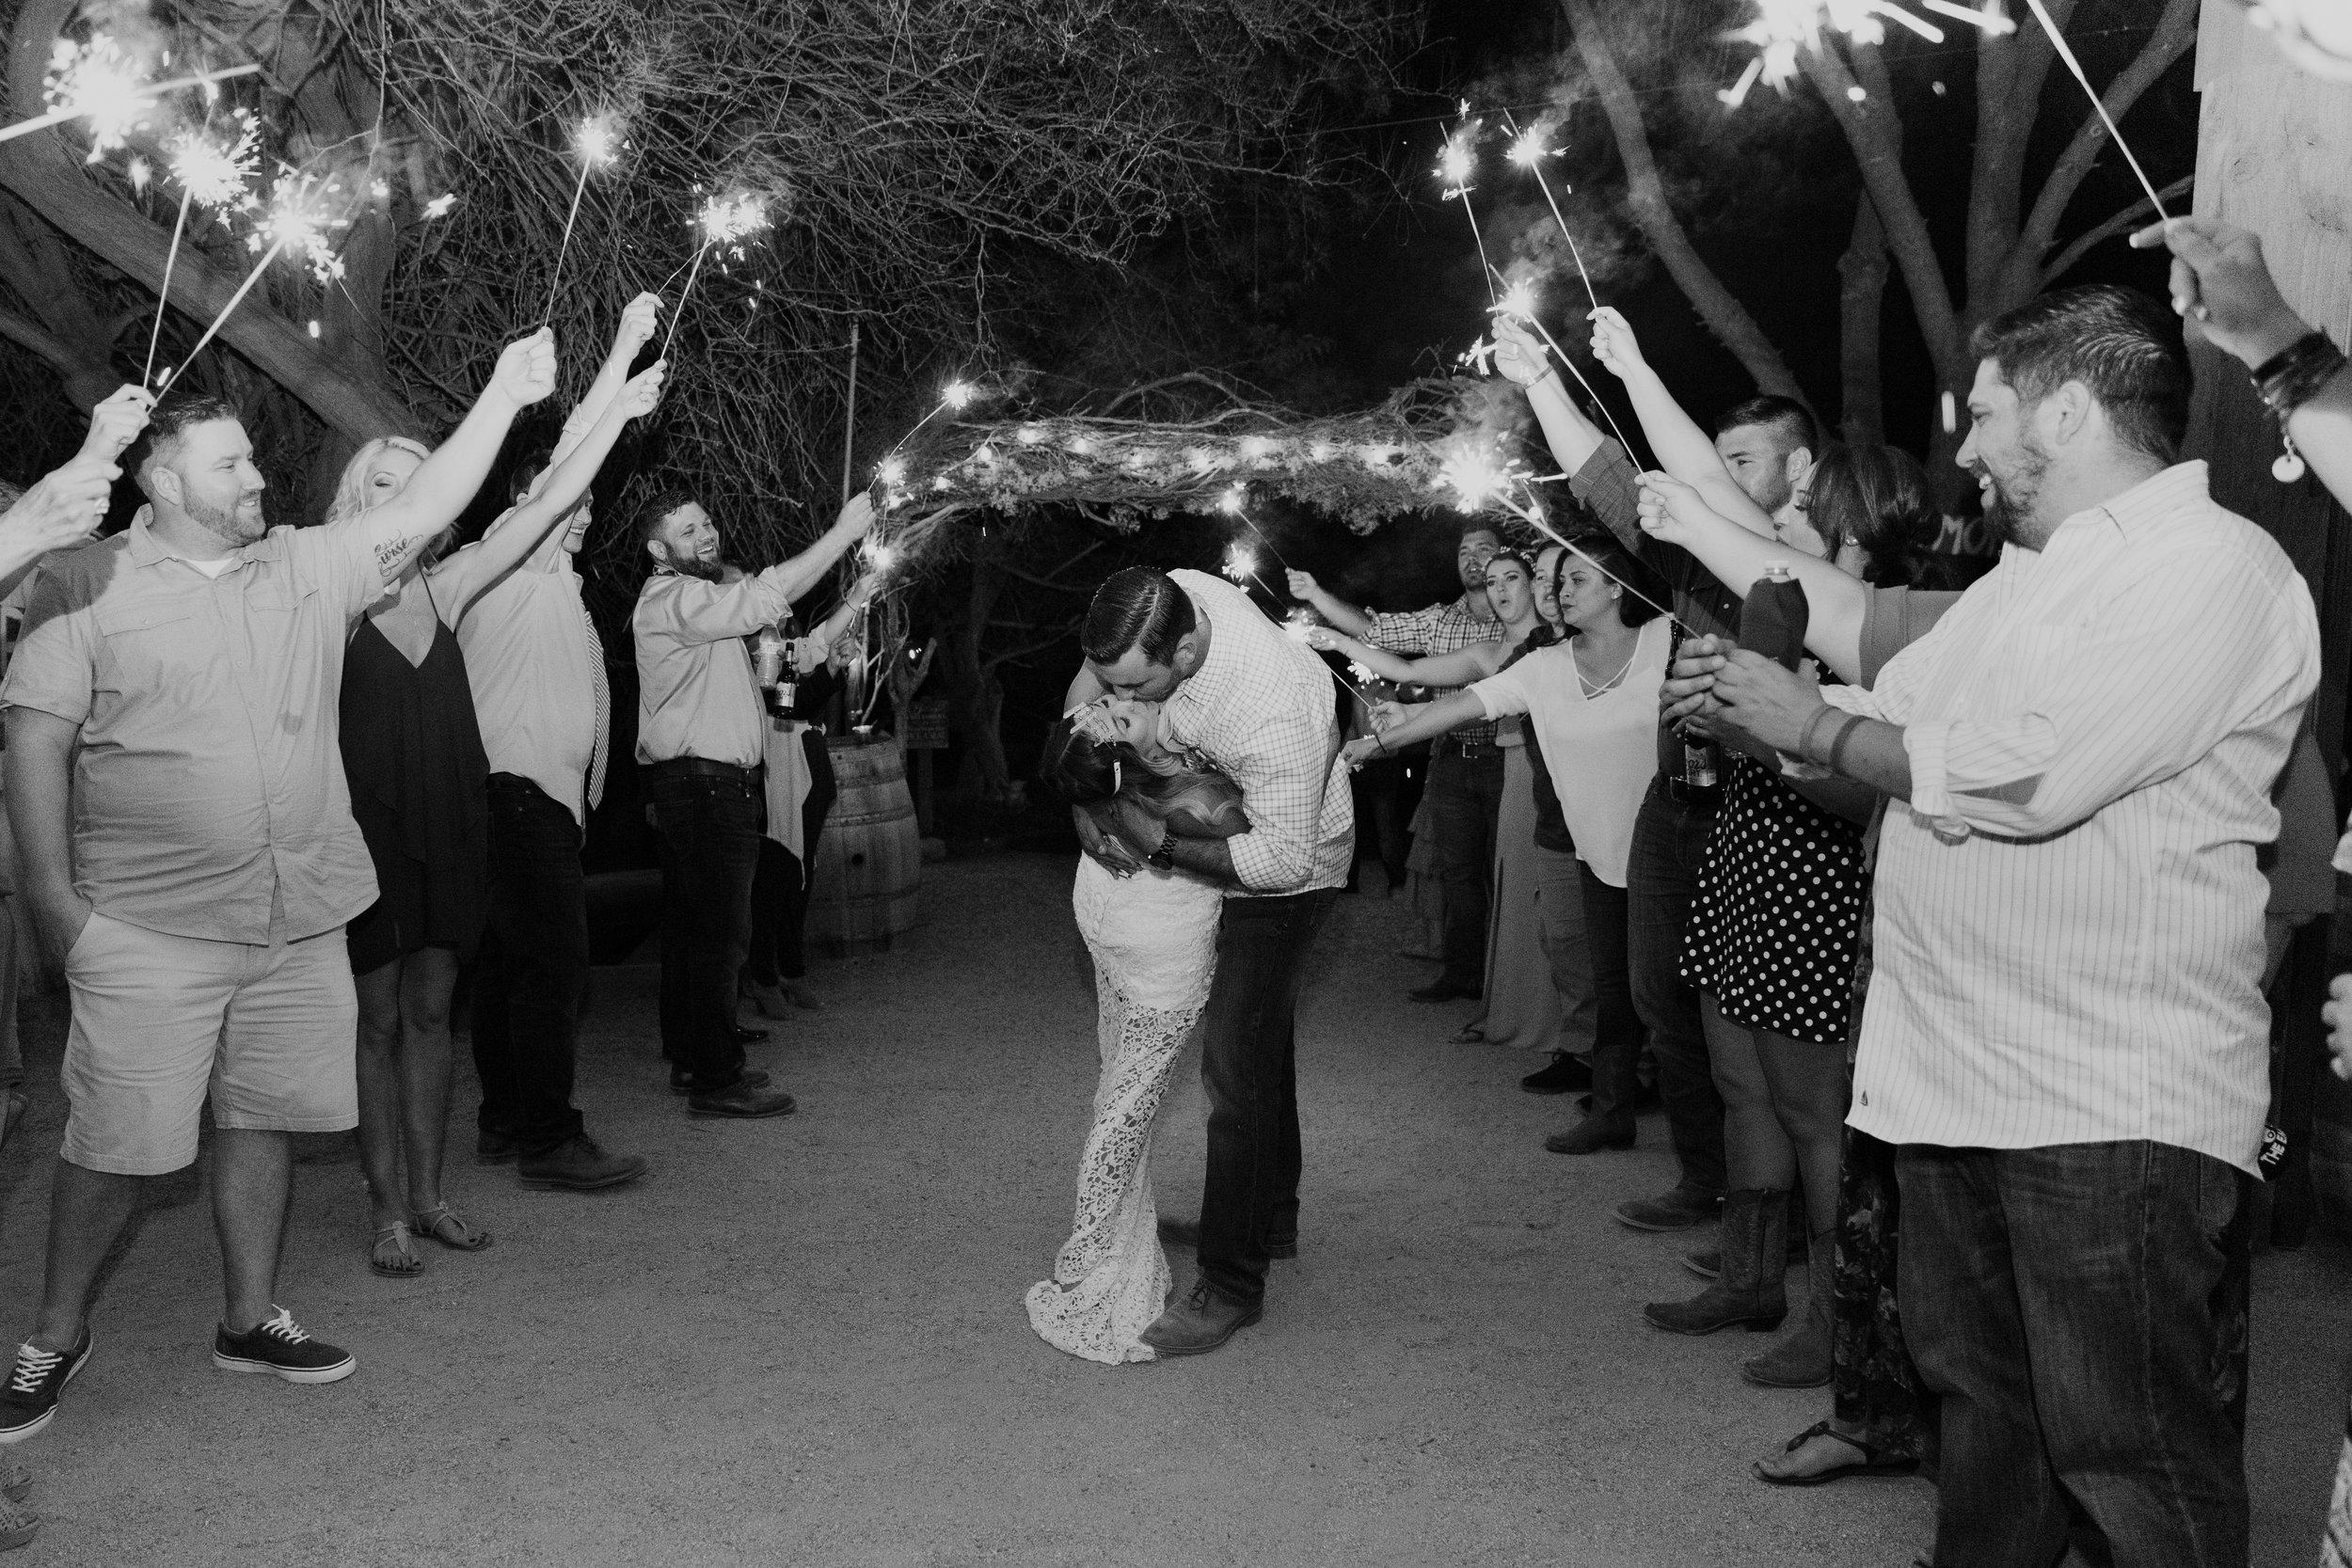 colorado-springs-wedding-photographer-52.jpg